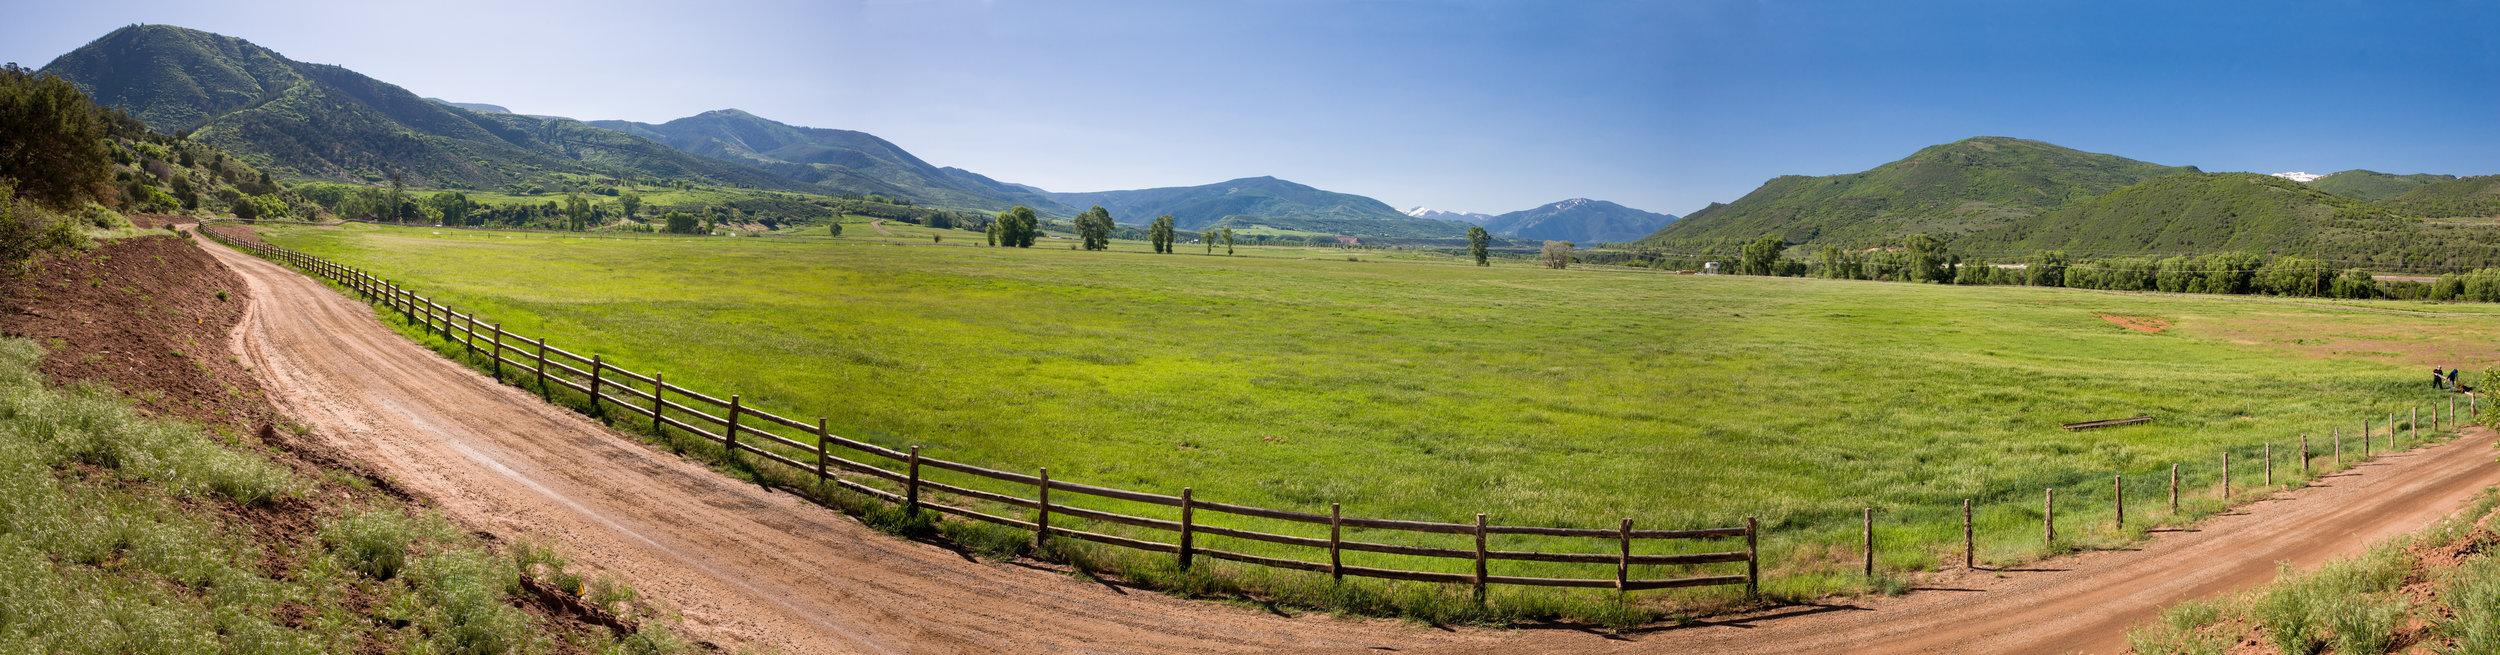 Aspen Valley Ranch Panorama1.jpg